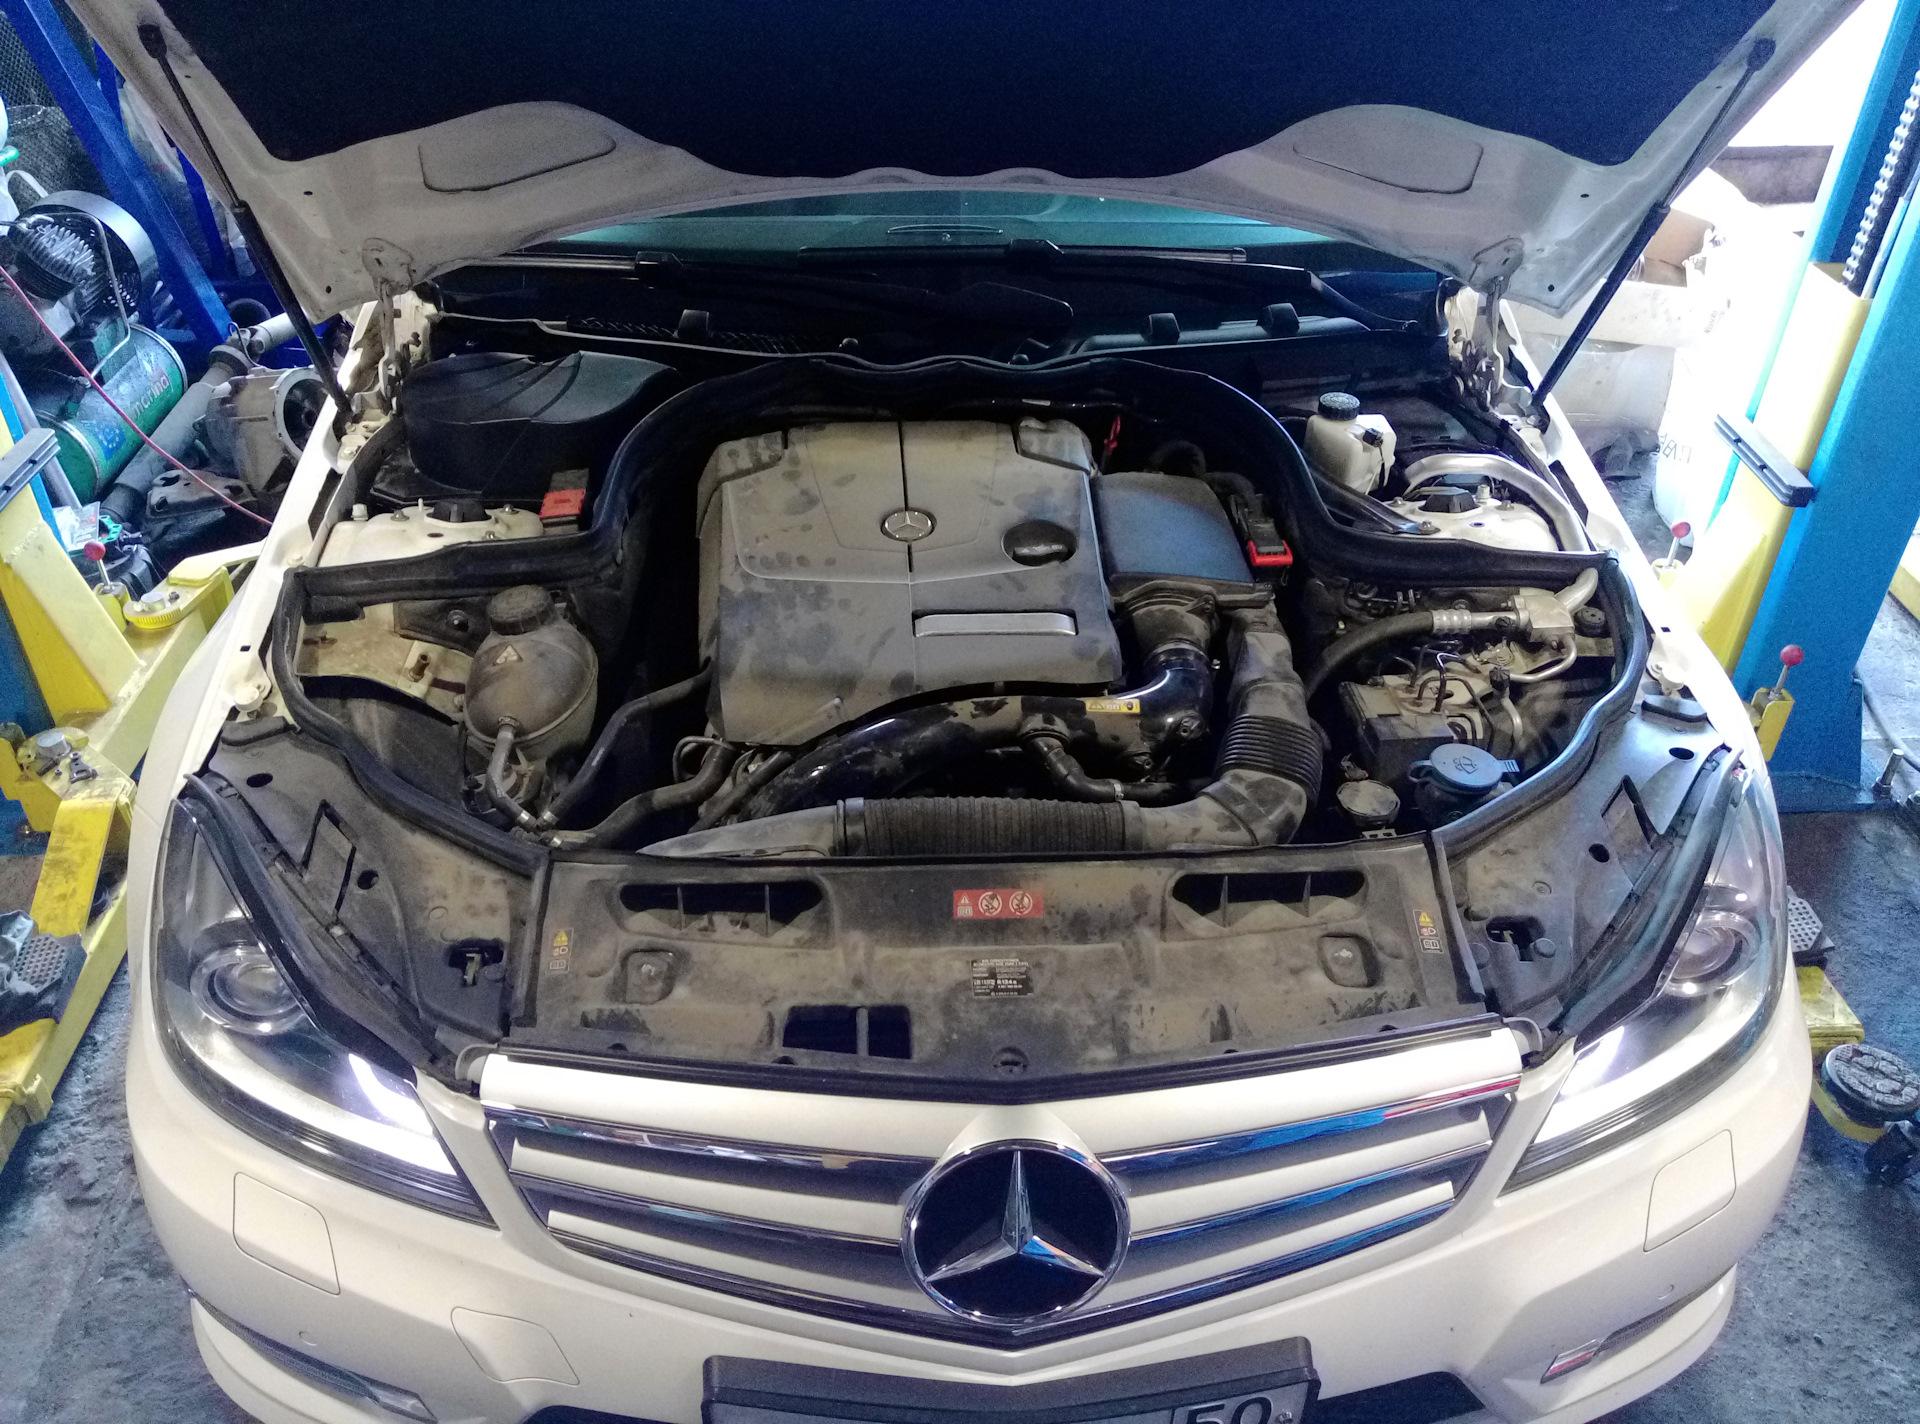 Поломка | P06DA00 — Mercedes-Benz C-class, 1 6 л , 2013 года на DRIVE2